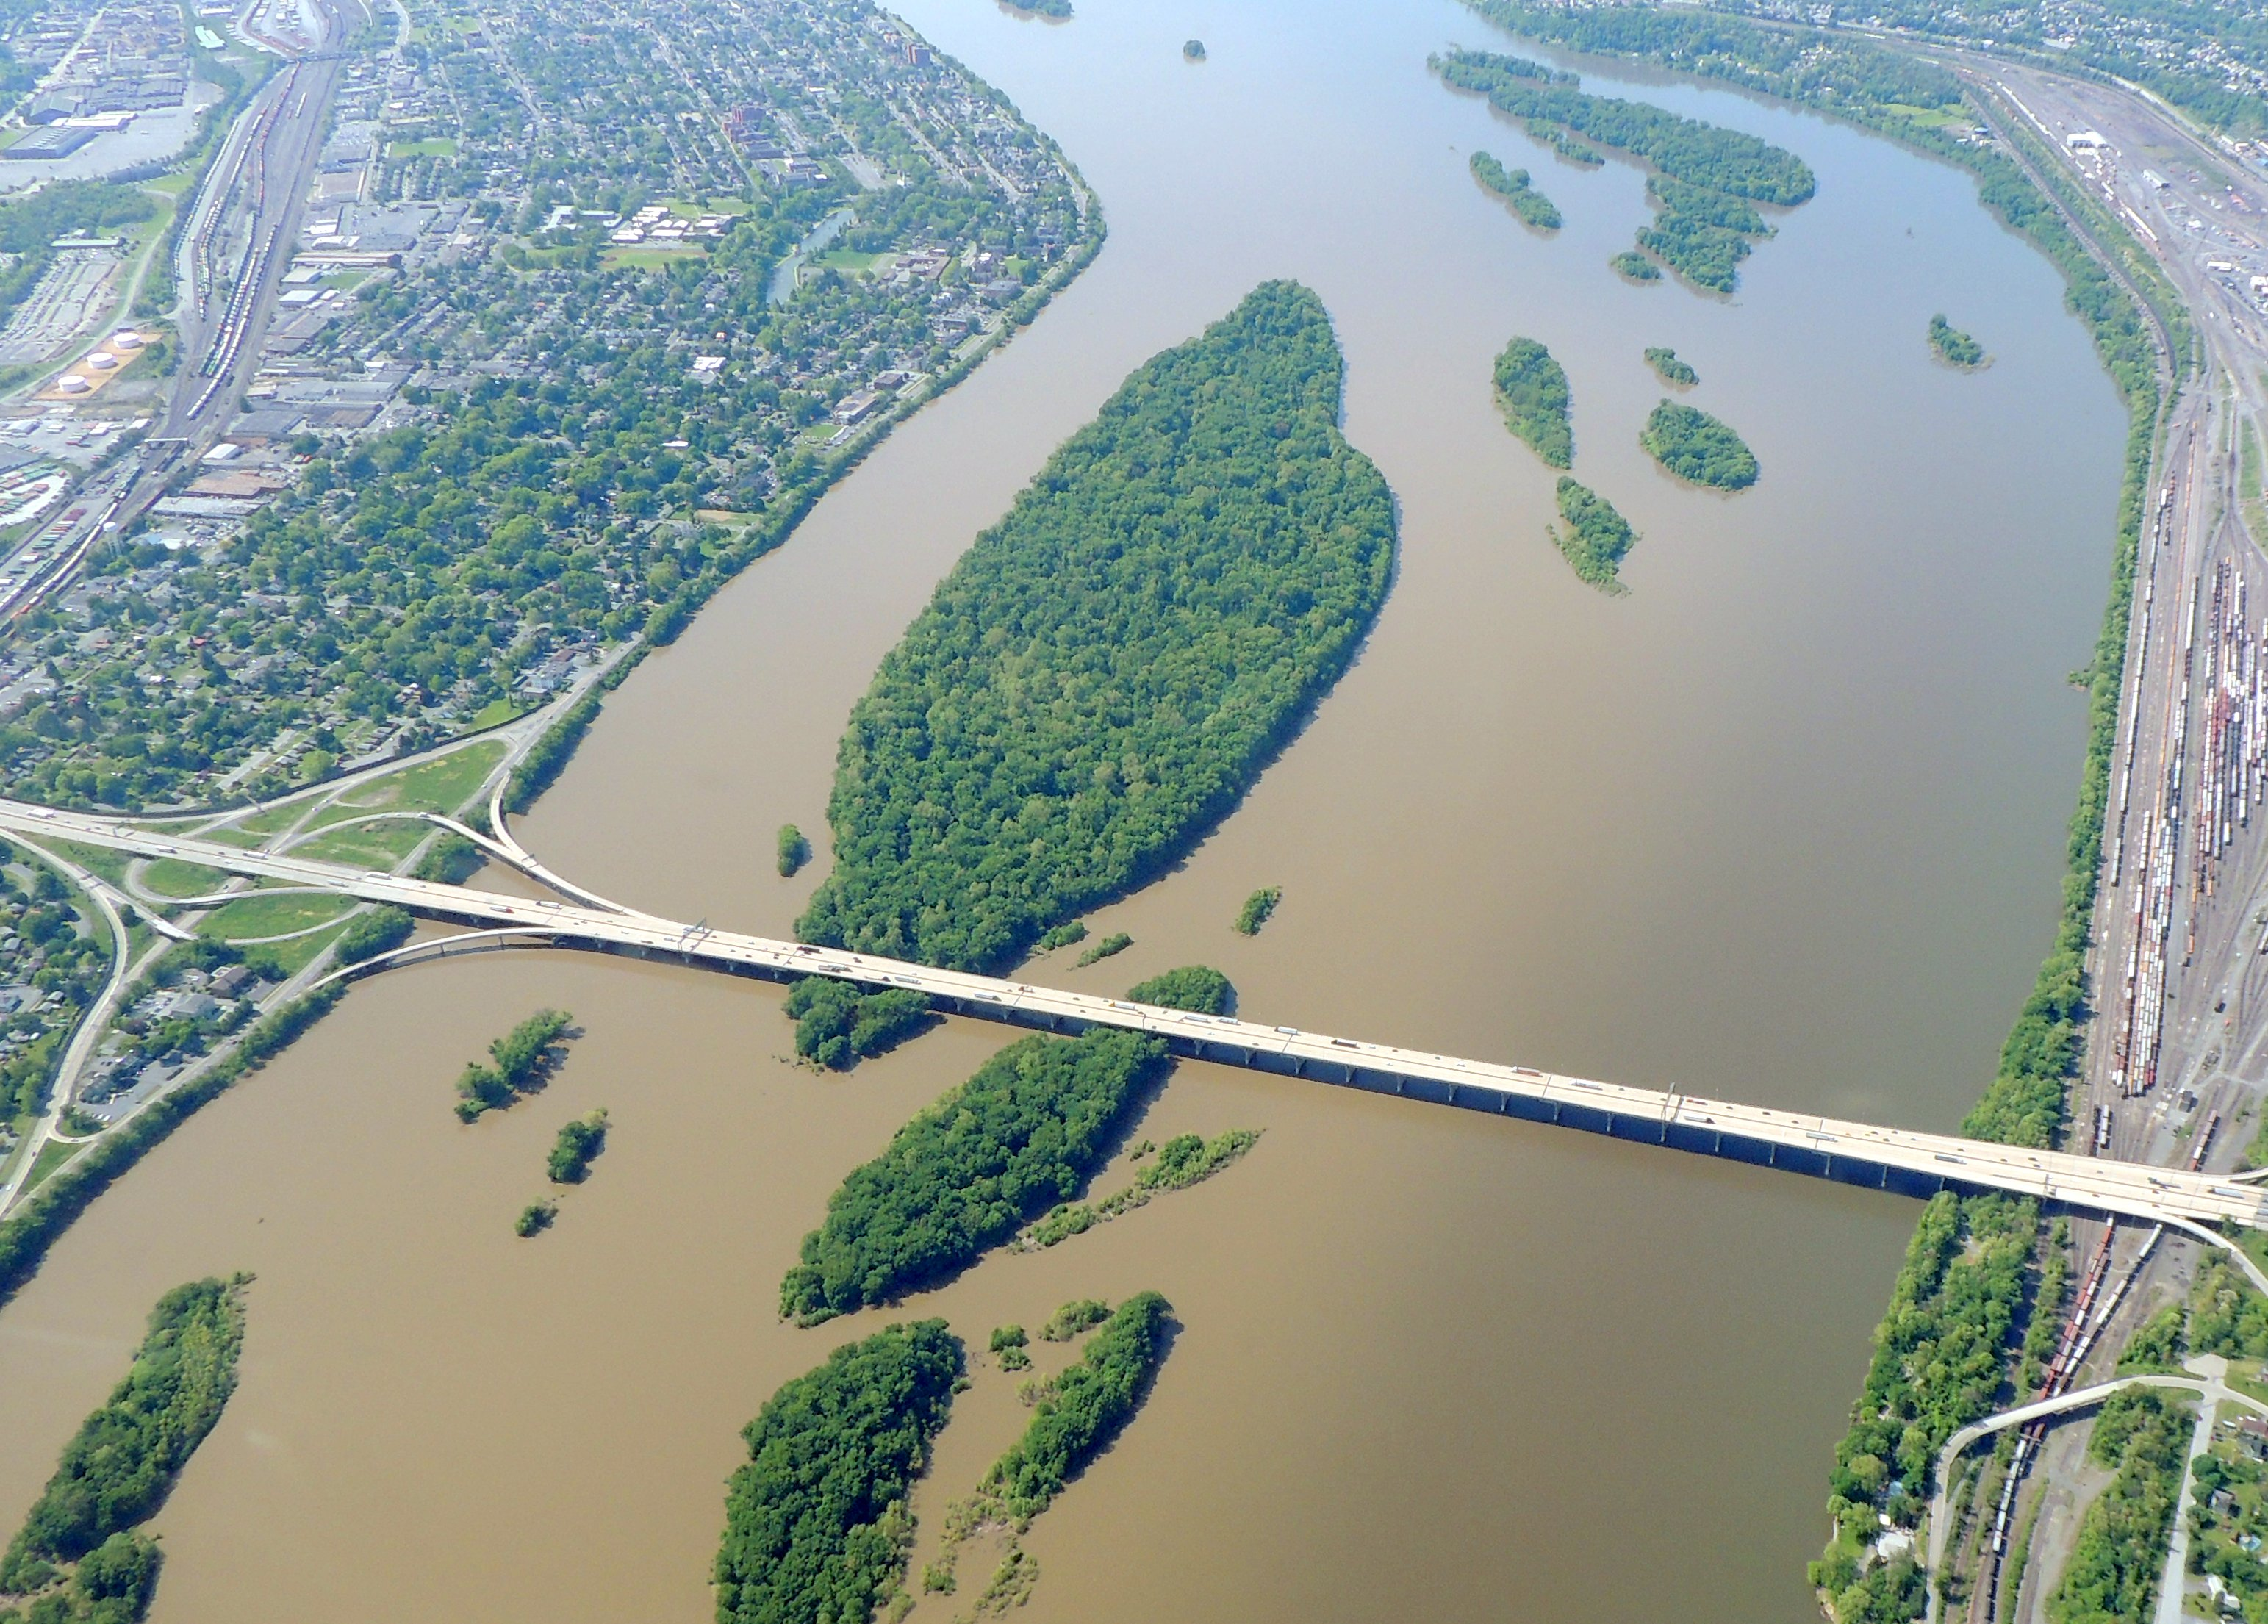 Bridge across the Susquehanna River at McCormicks Island  (Harrisburg PA)